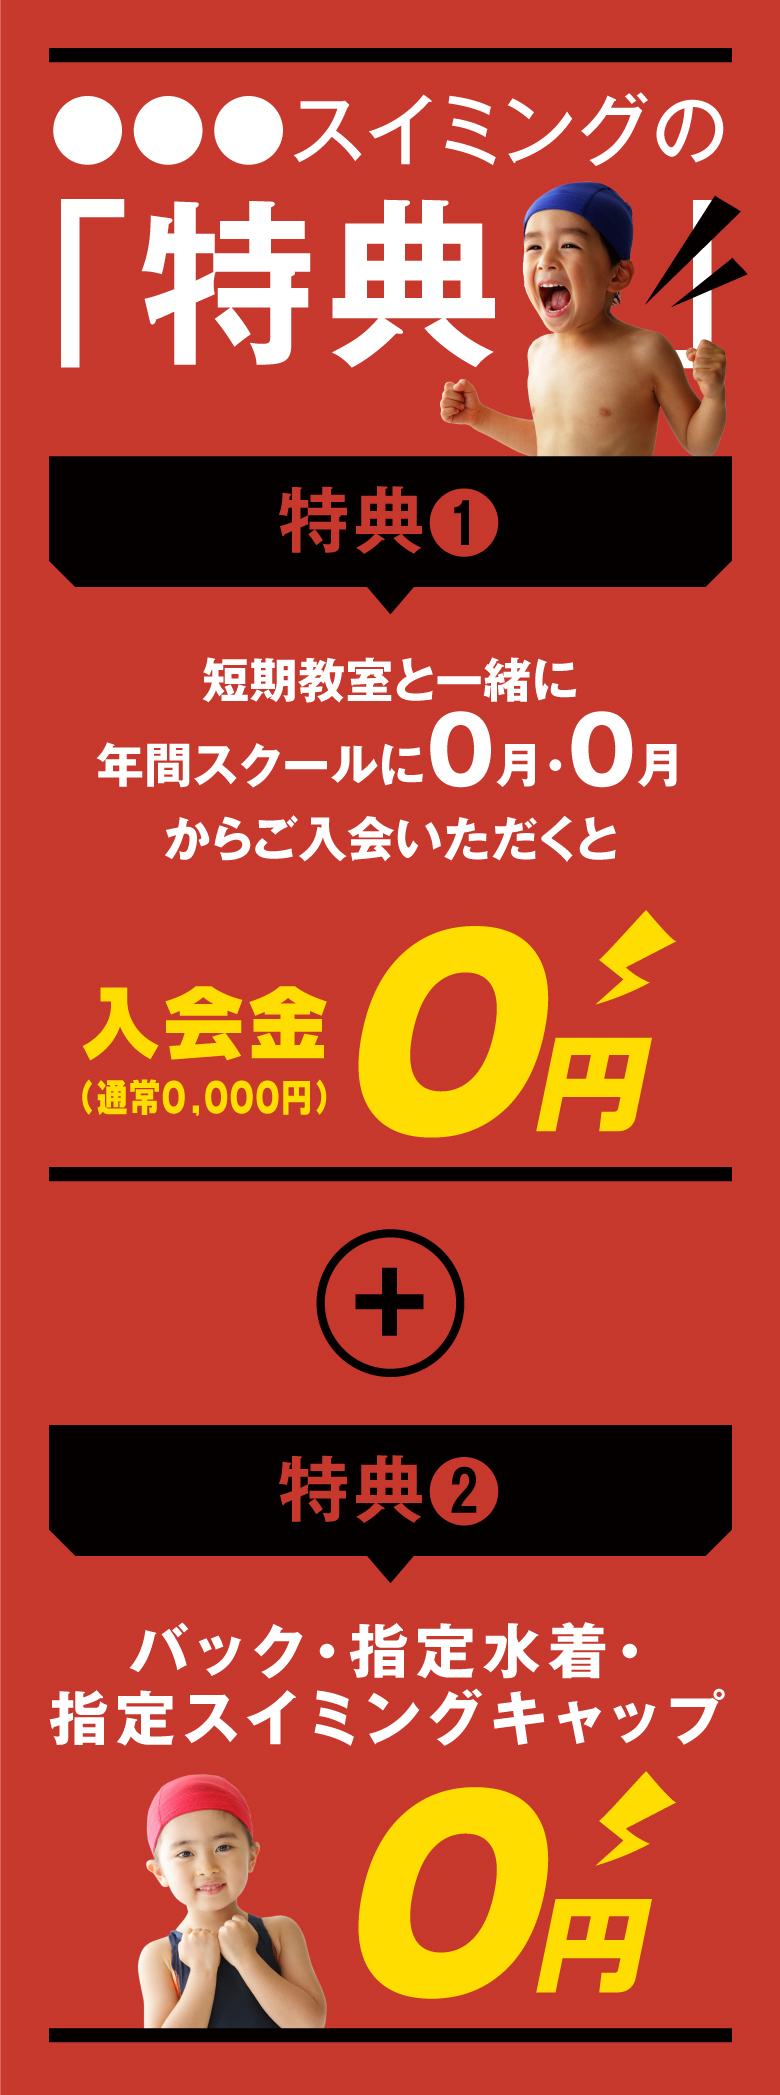 cv-case-ch-20h_a-02